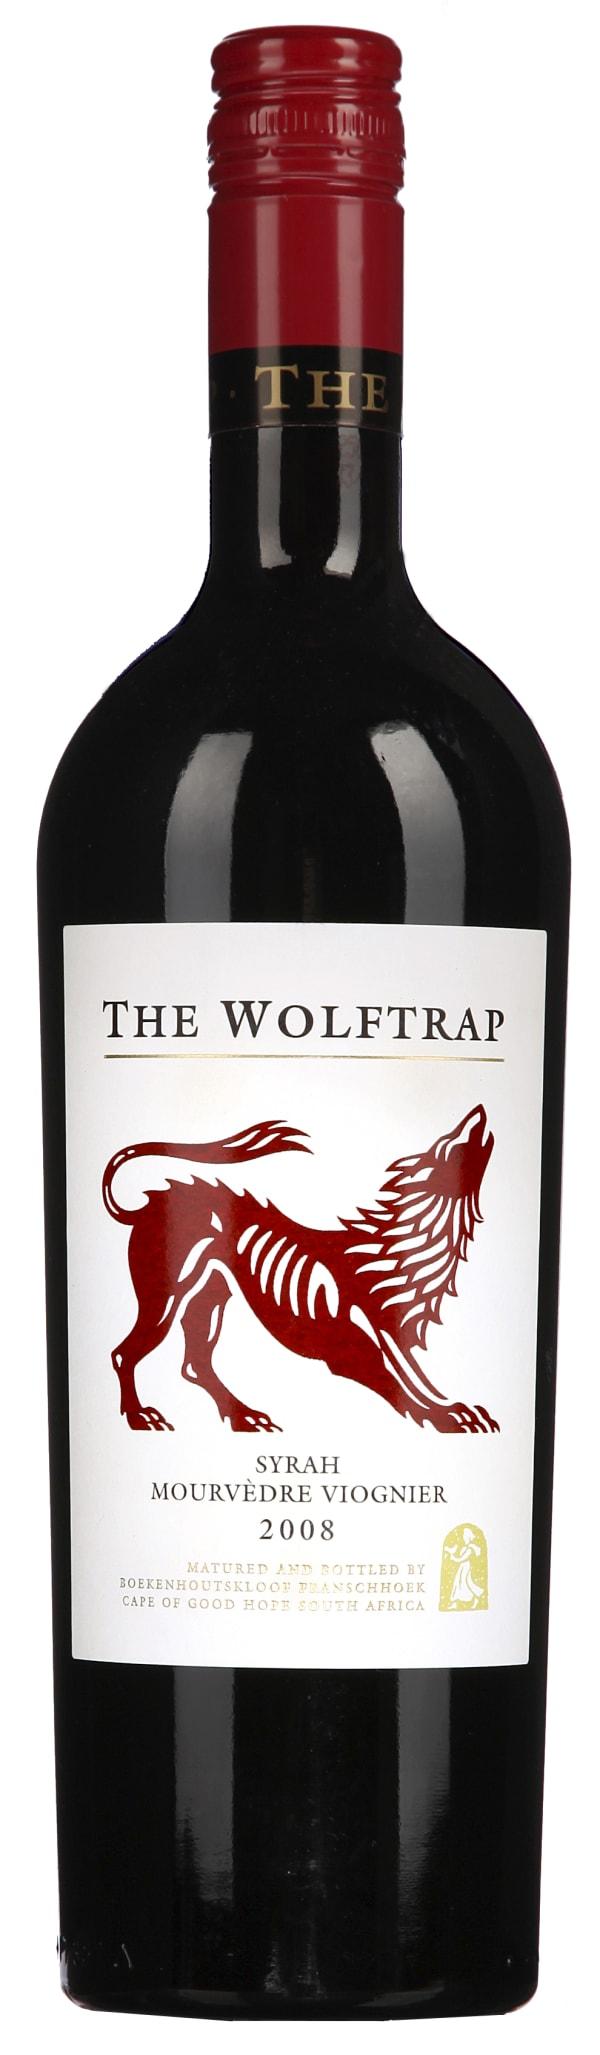 The Wolftrap Syrah Mourvèdre Viognier 2009